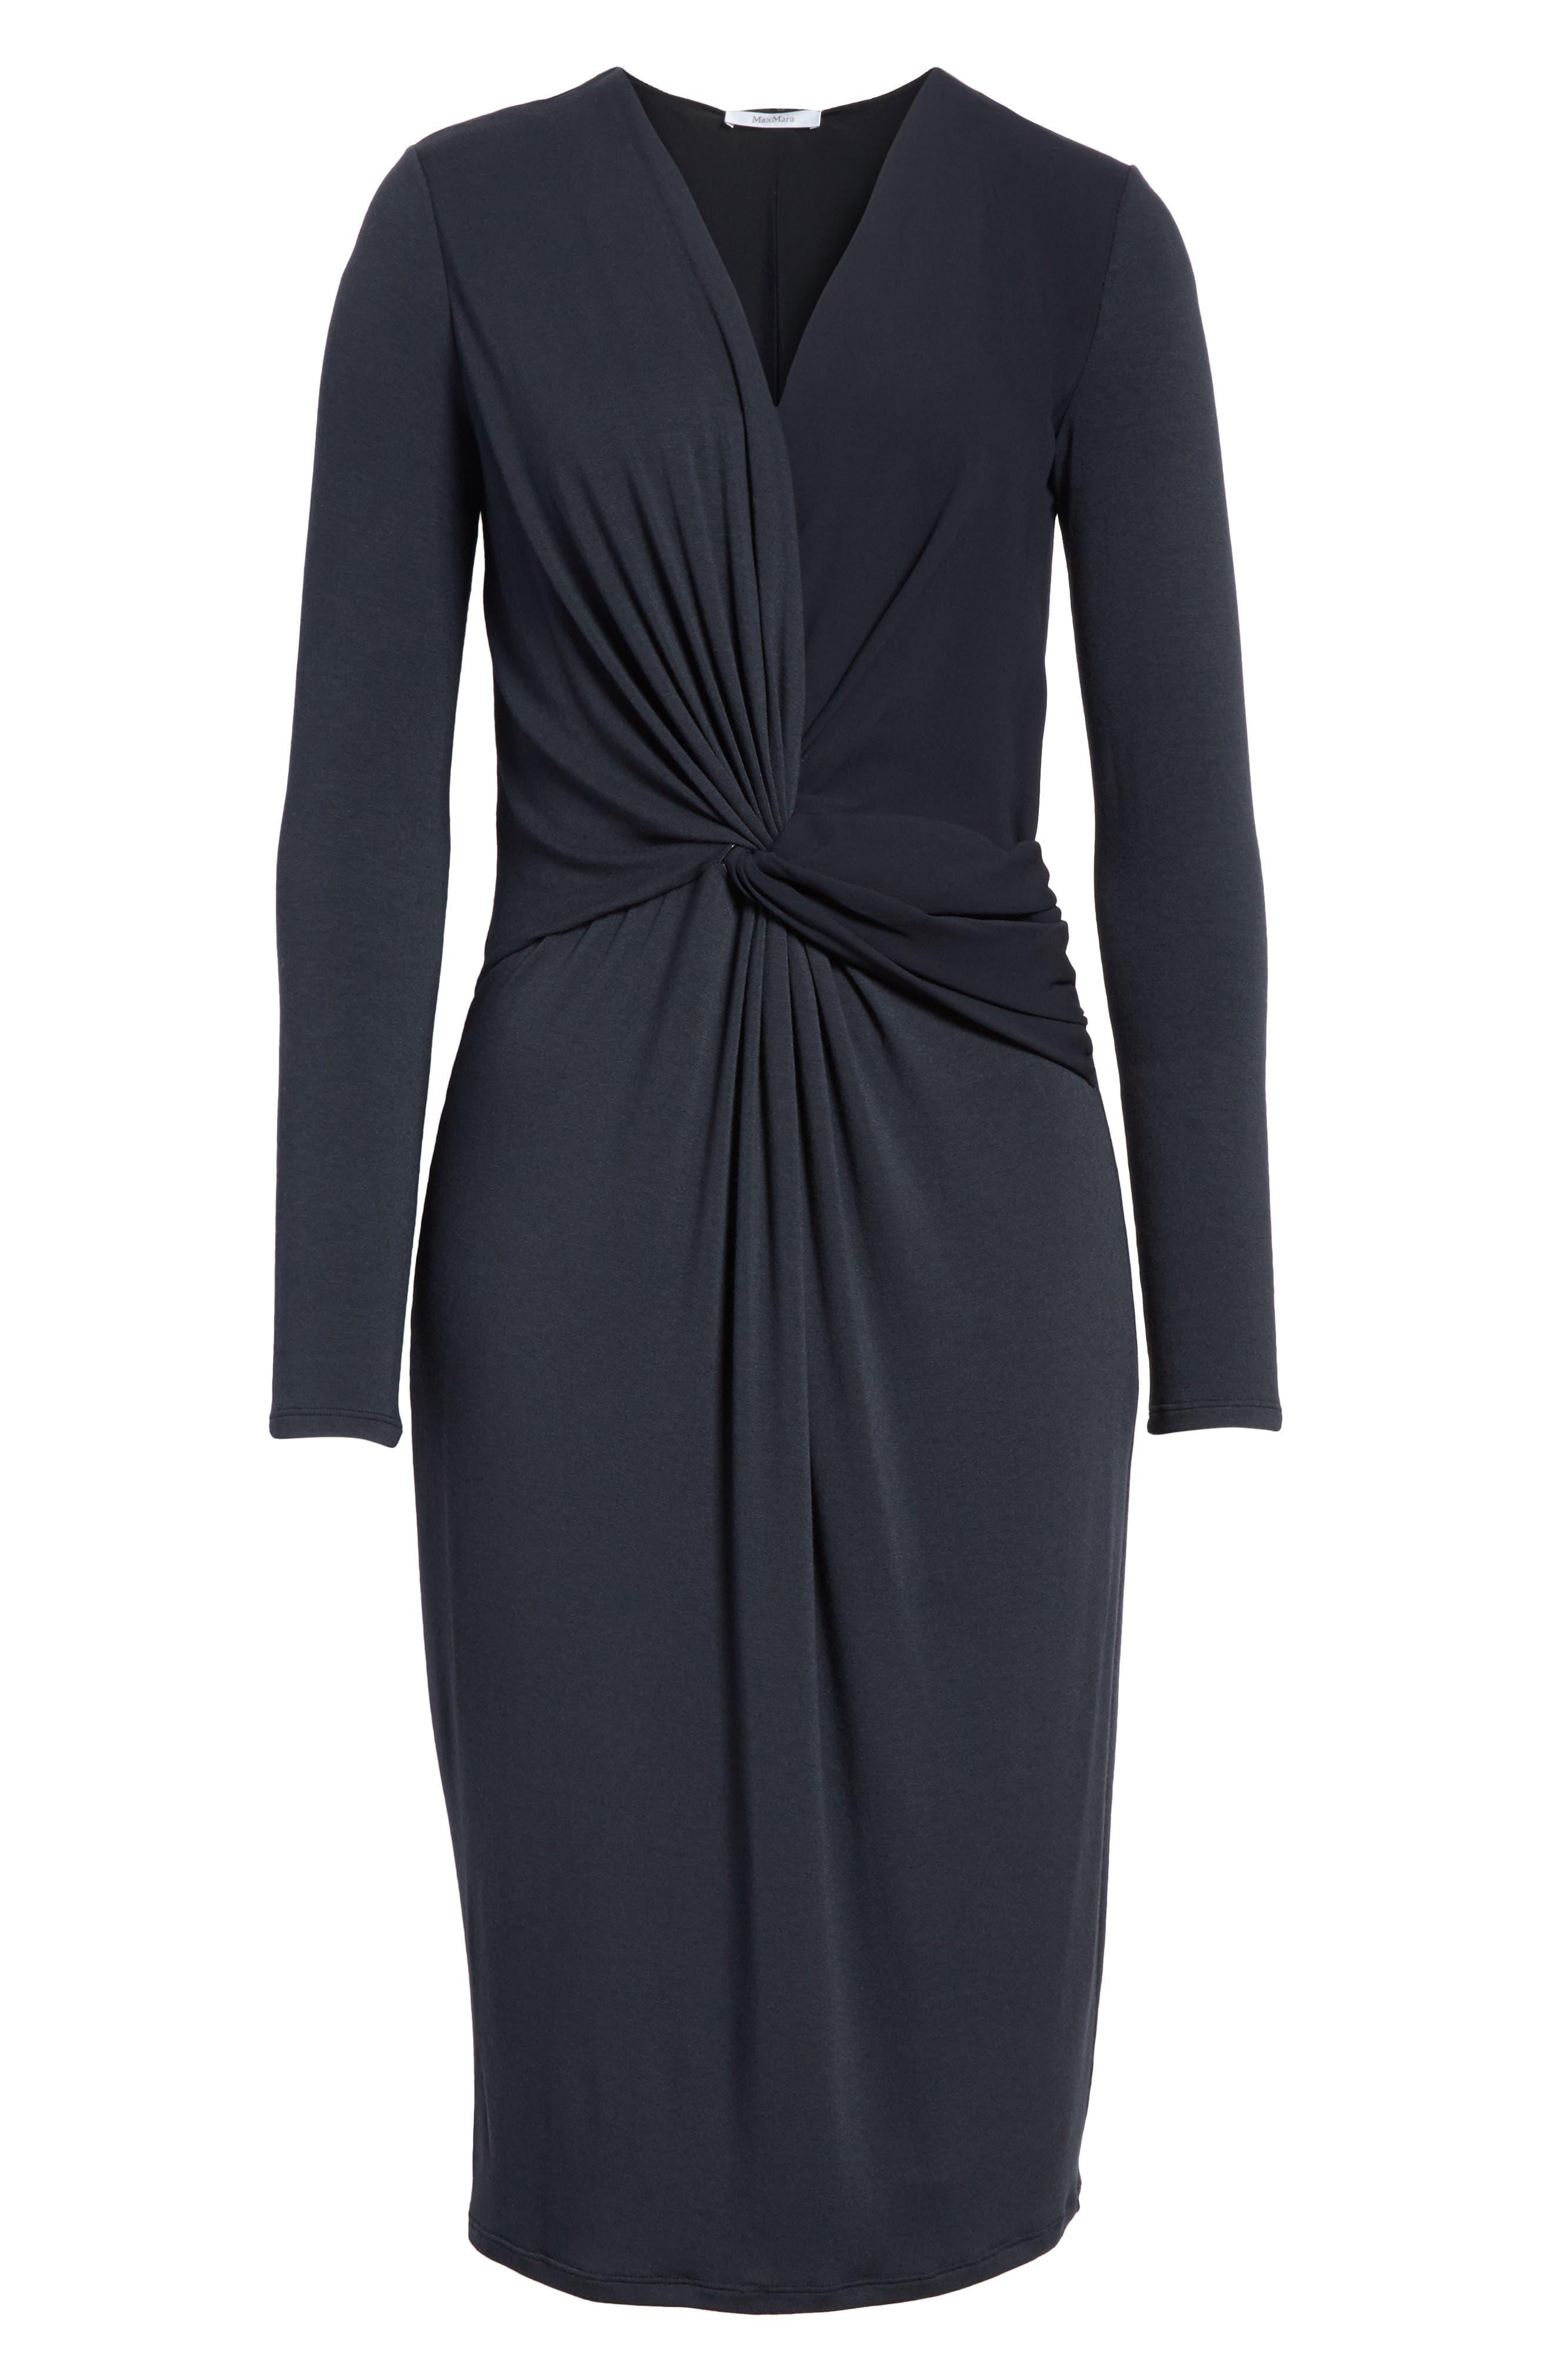 Petalo Twisted Dress,                             Alternate thumbnail 6, color,                             Navy Blue